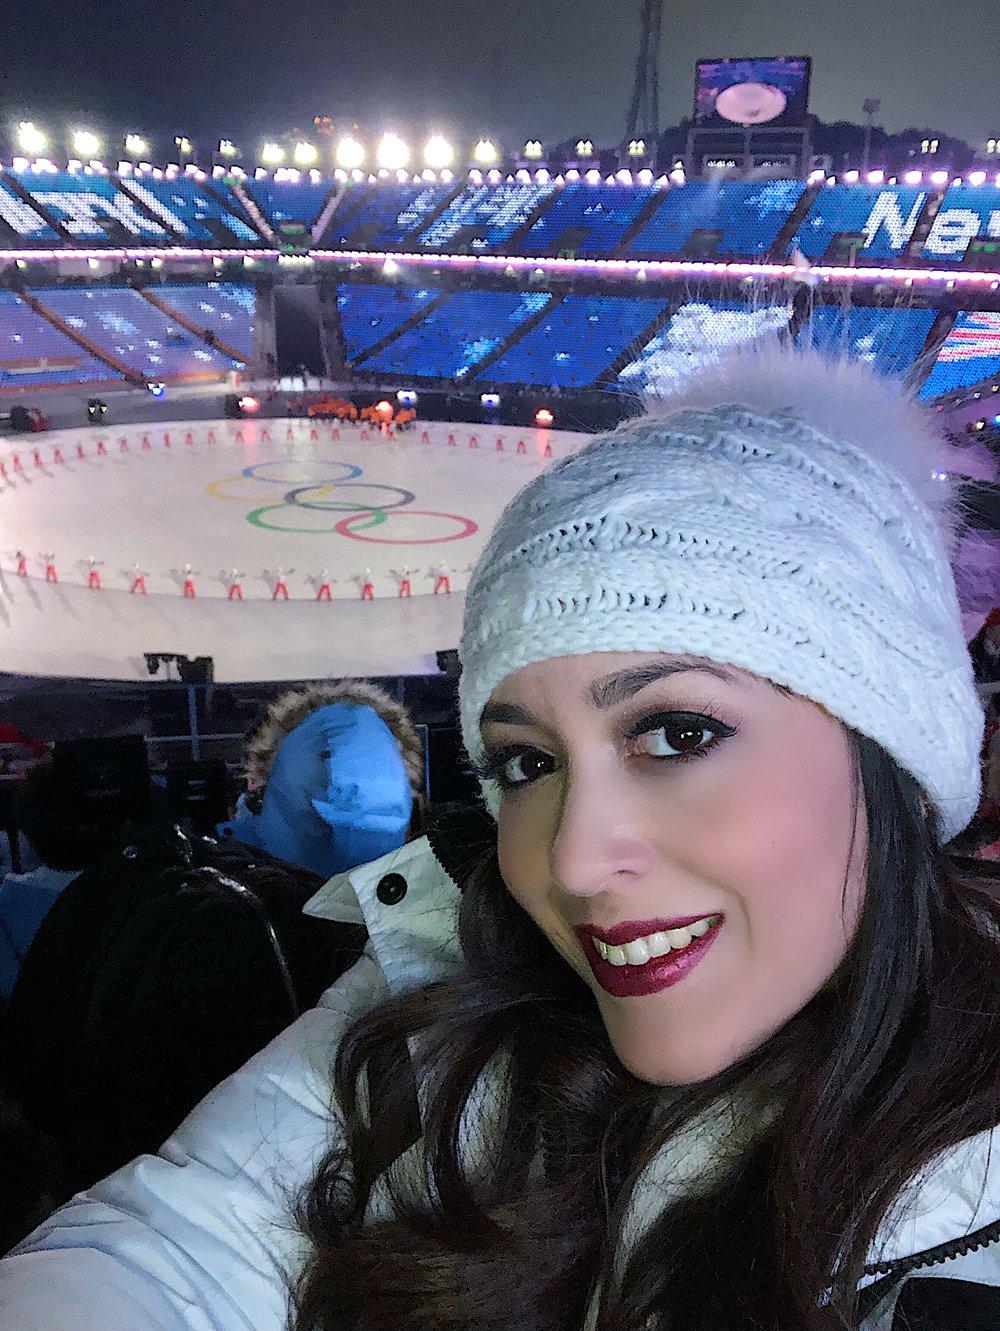 Winter Olympics Games Spanglishfashion 2018 (23).JPG